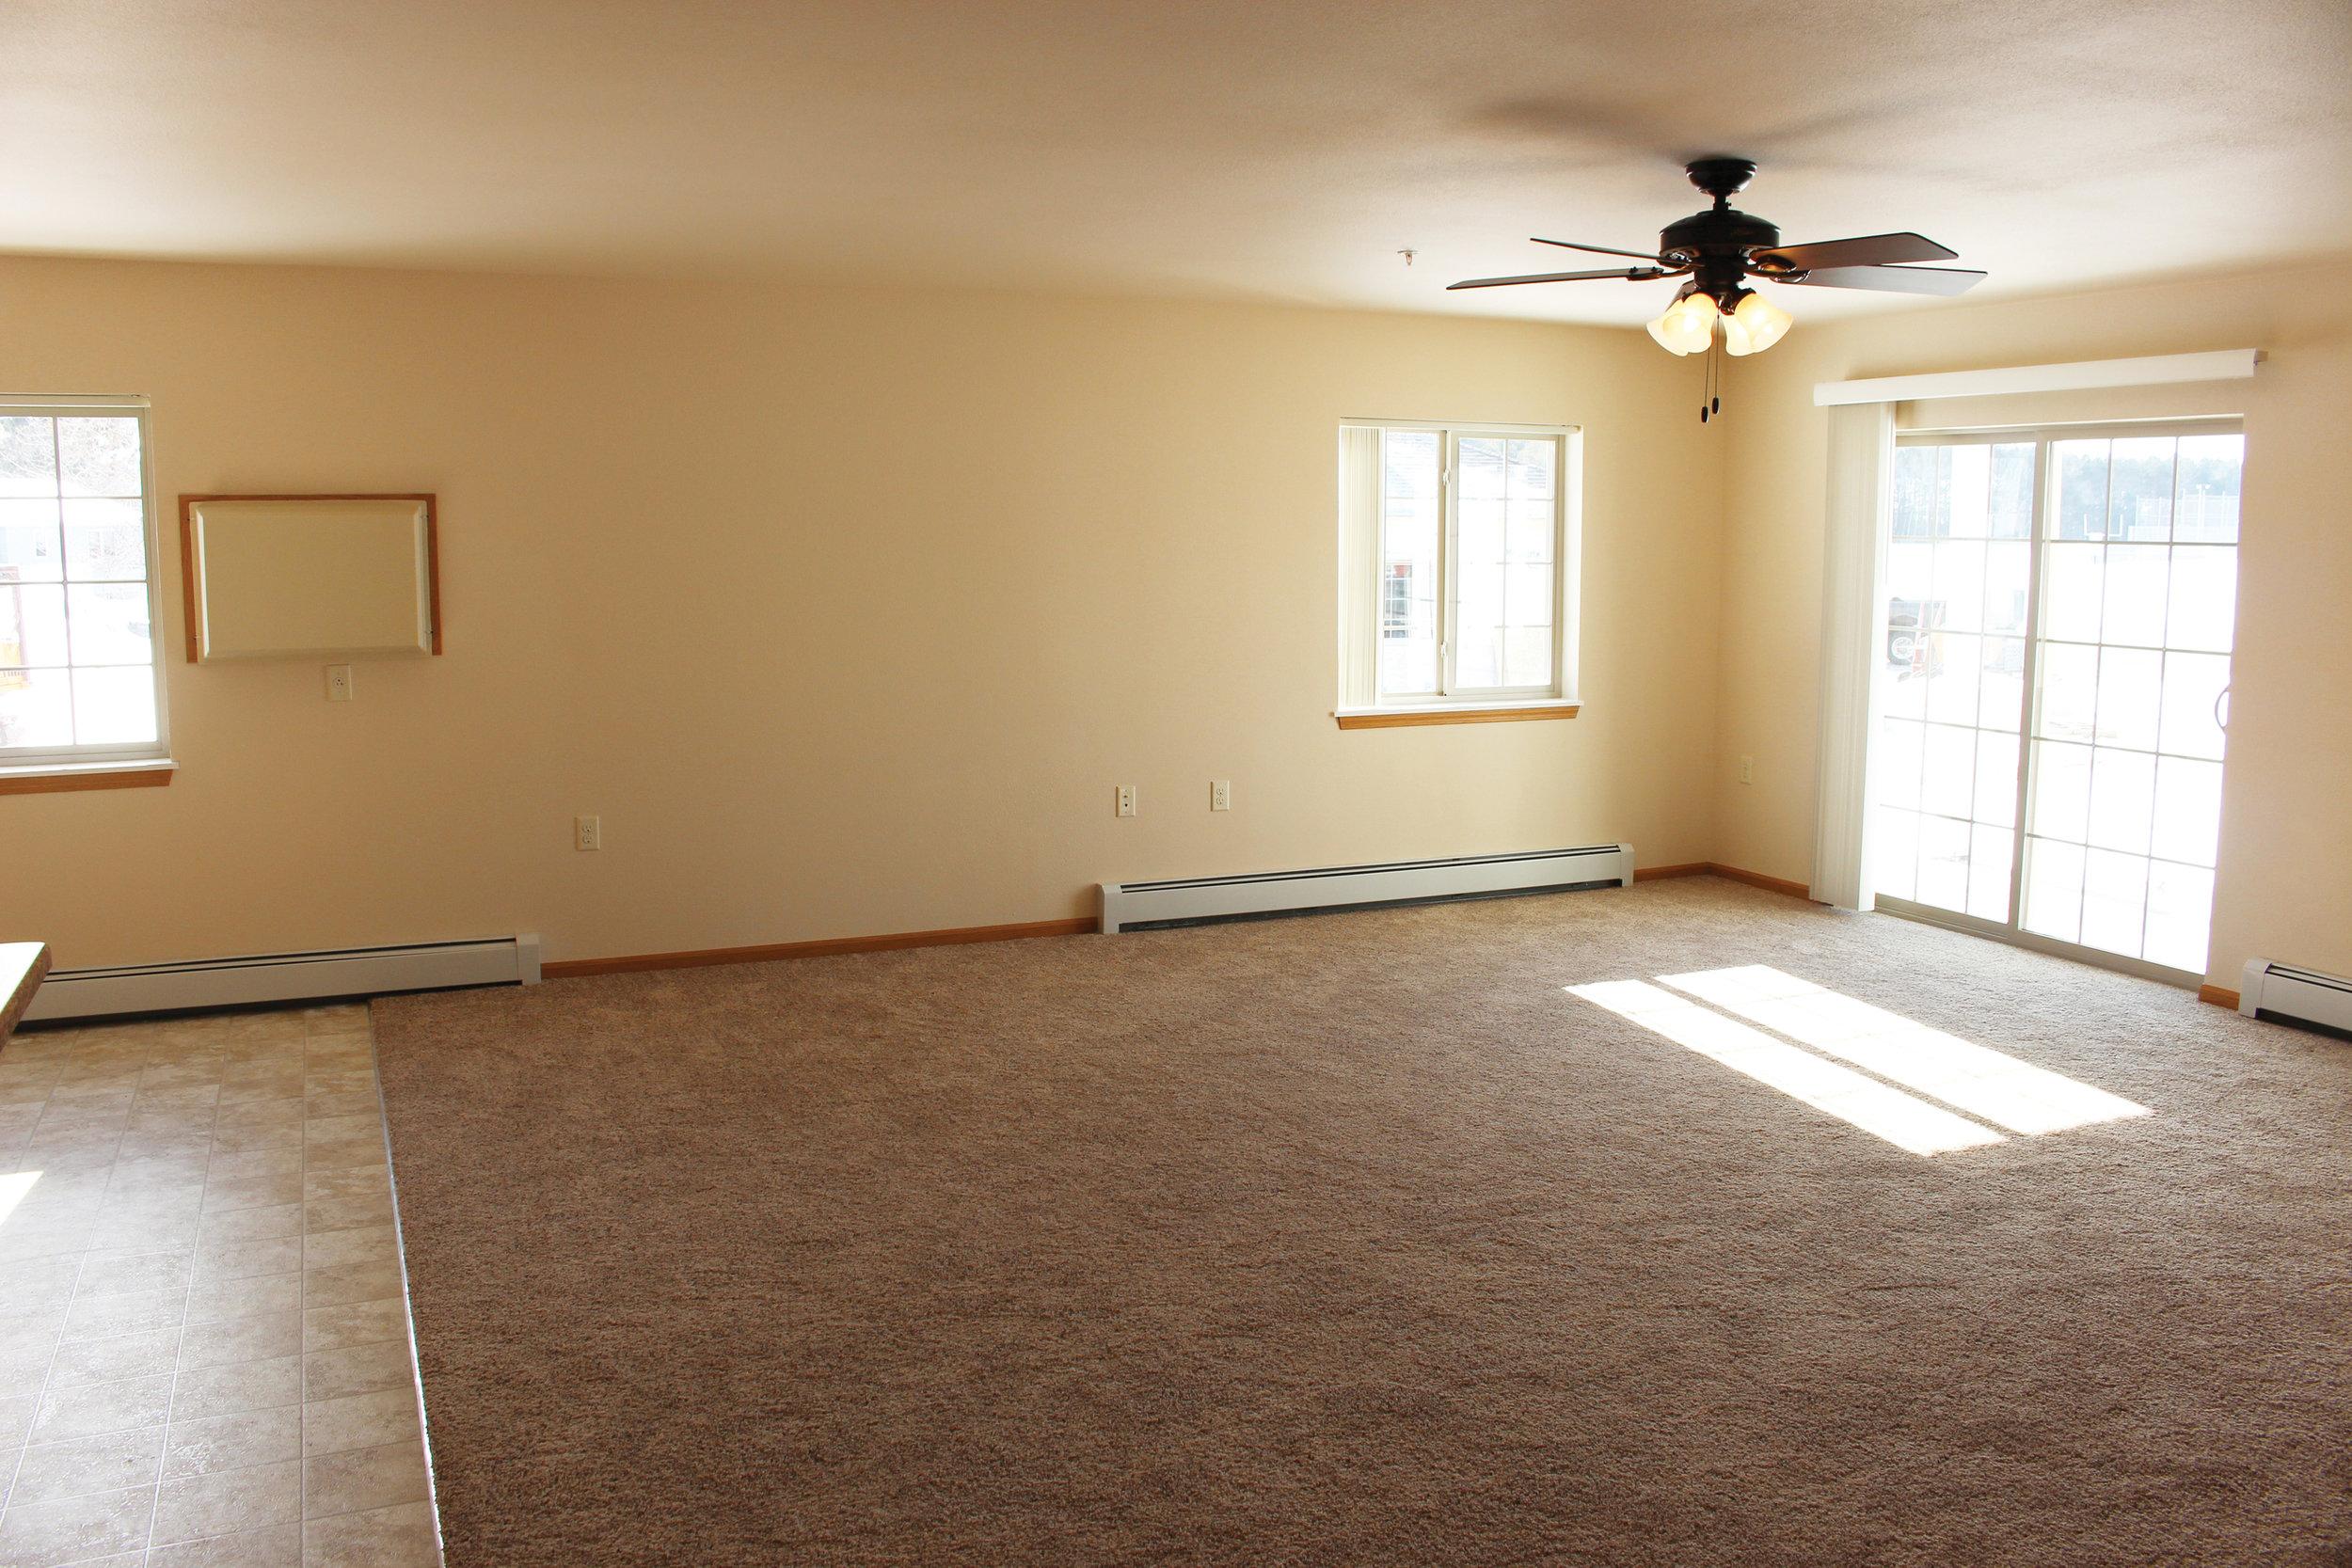 Northside-Living-Room2.jpg